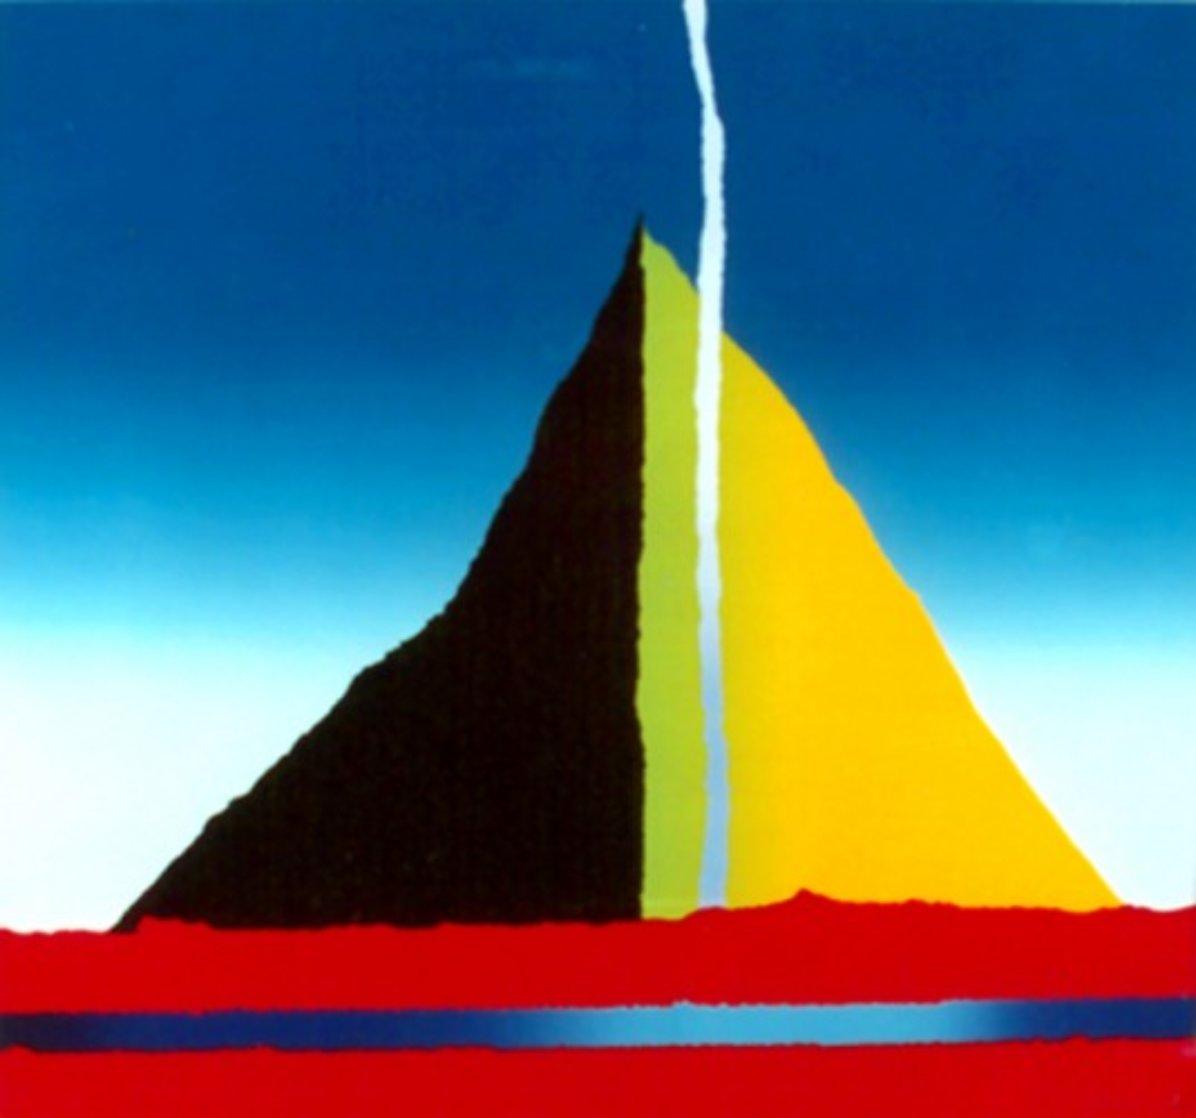 Deja Vu 1984 Limited Edition Print by Arthur Secunda